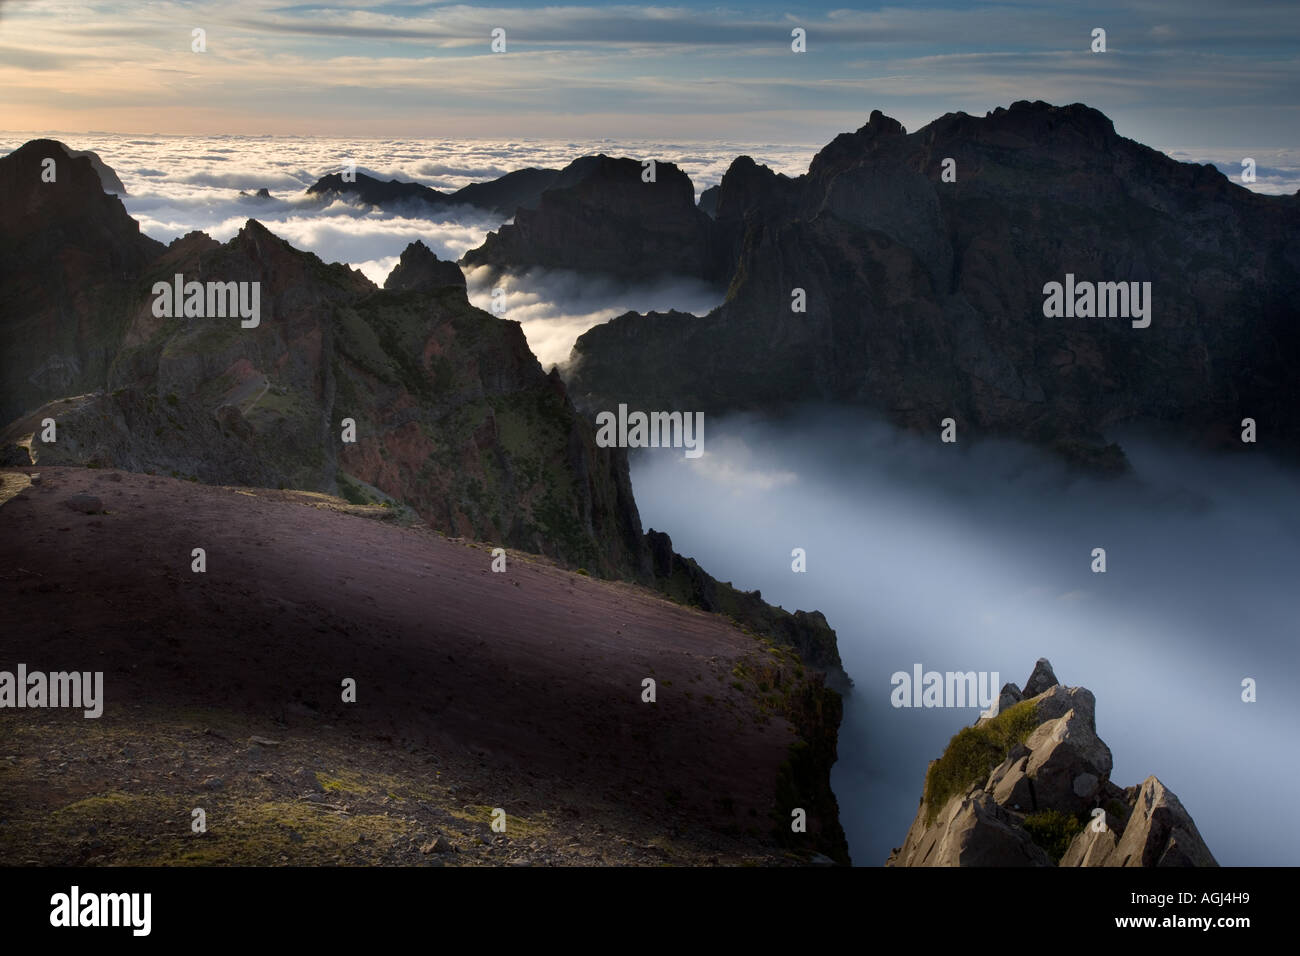 Madeira paesaggio di montagna a Pico de Arieiro Immagini Stock